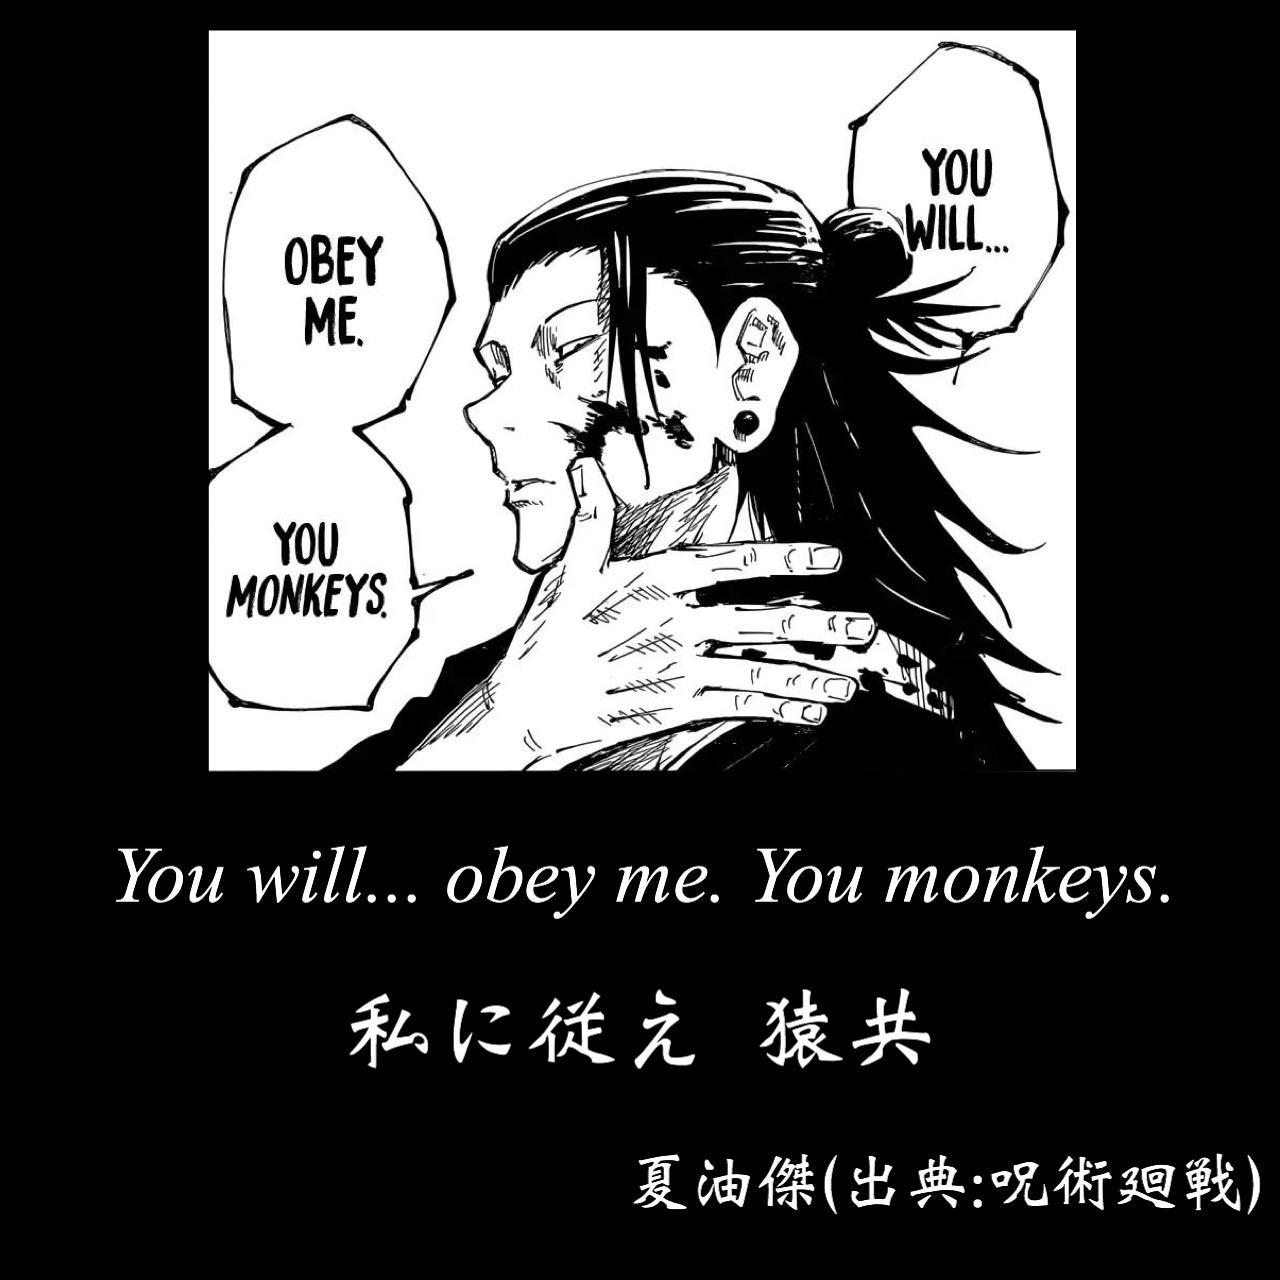 戦 呪術 夏 油 廻